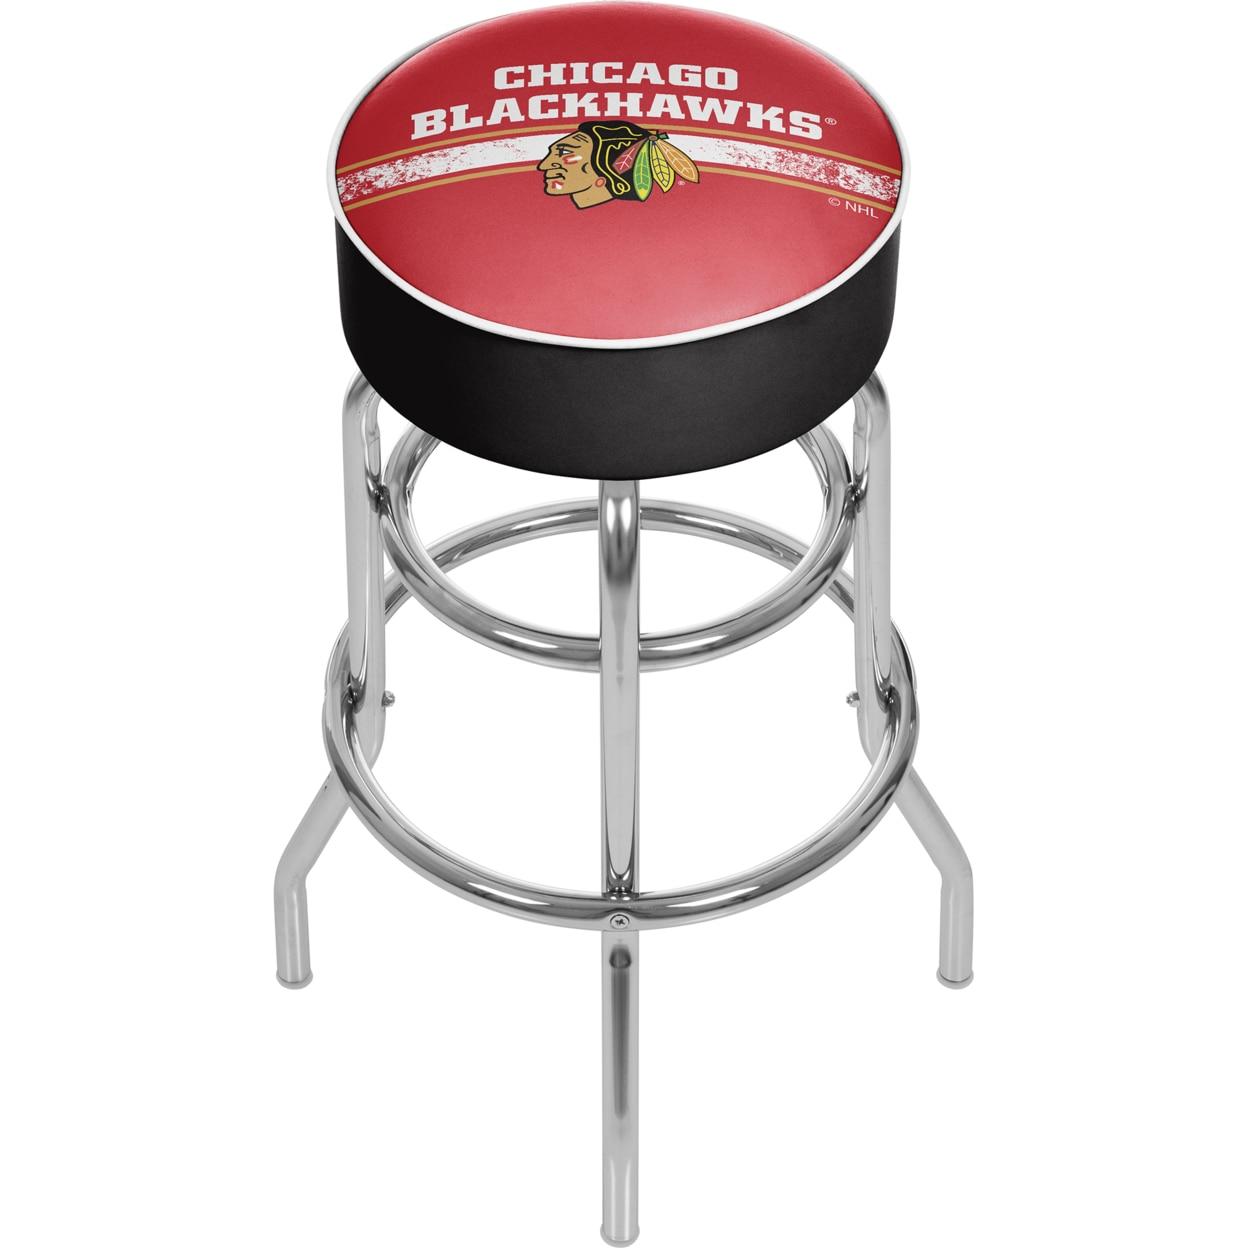 NHL Chrome Bar Stool with Swivel - Chicago Blackhawks майка борцовка print bar chicago blackhawks